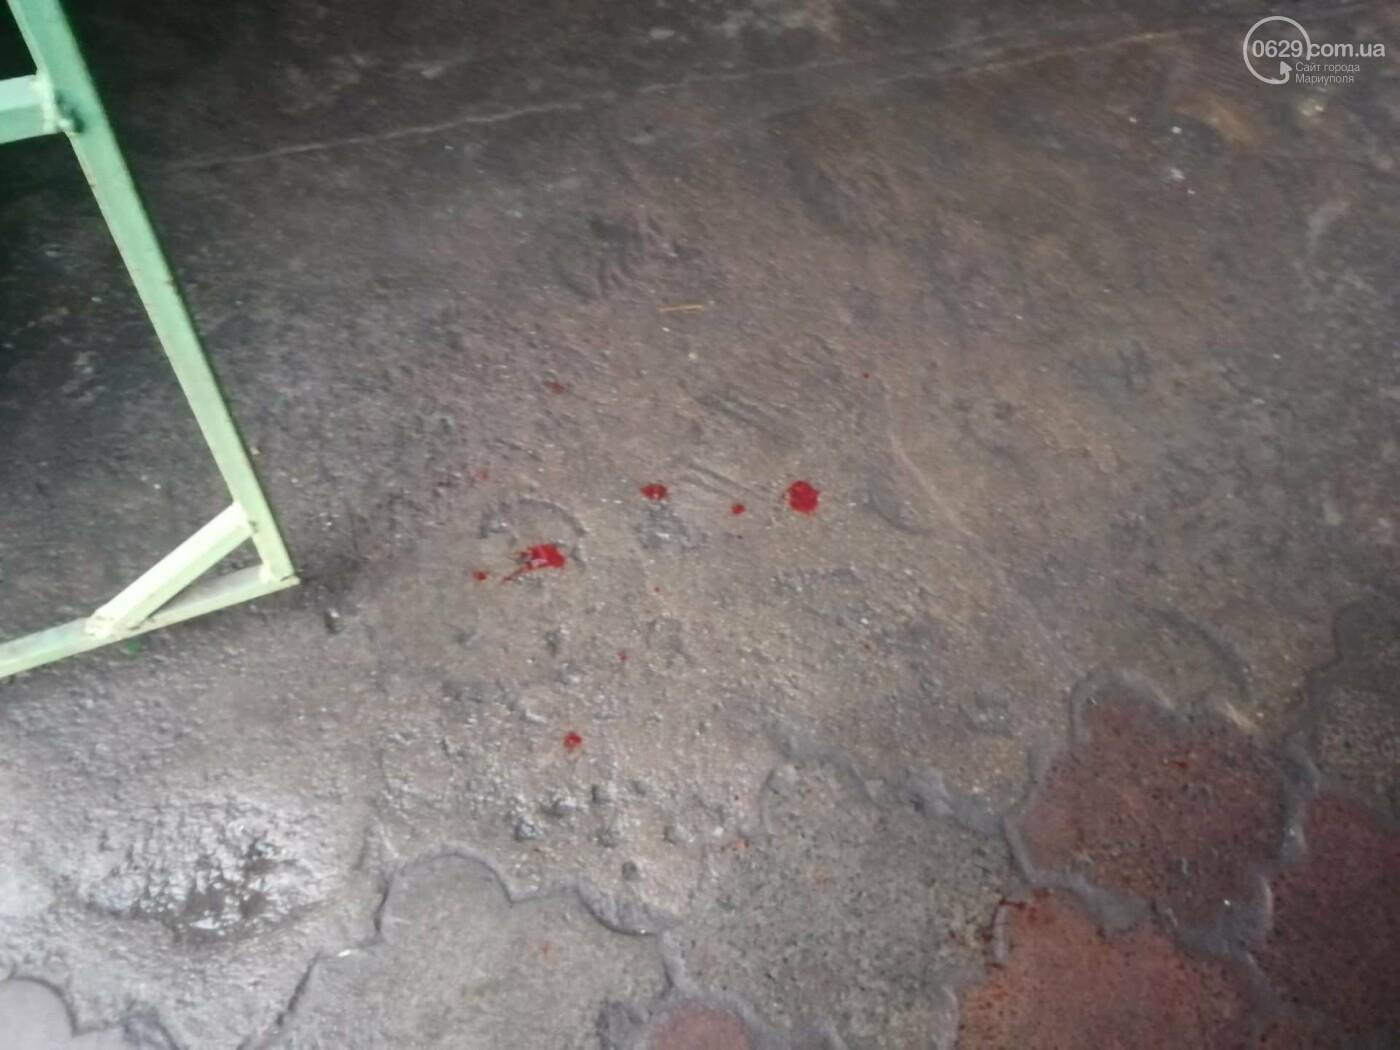 В «наливайке» на Бахчиванджи разнимали драку, - Ф, фото-1